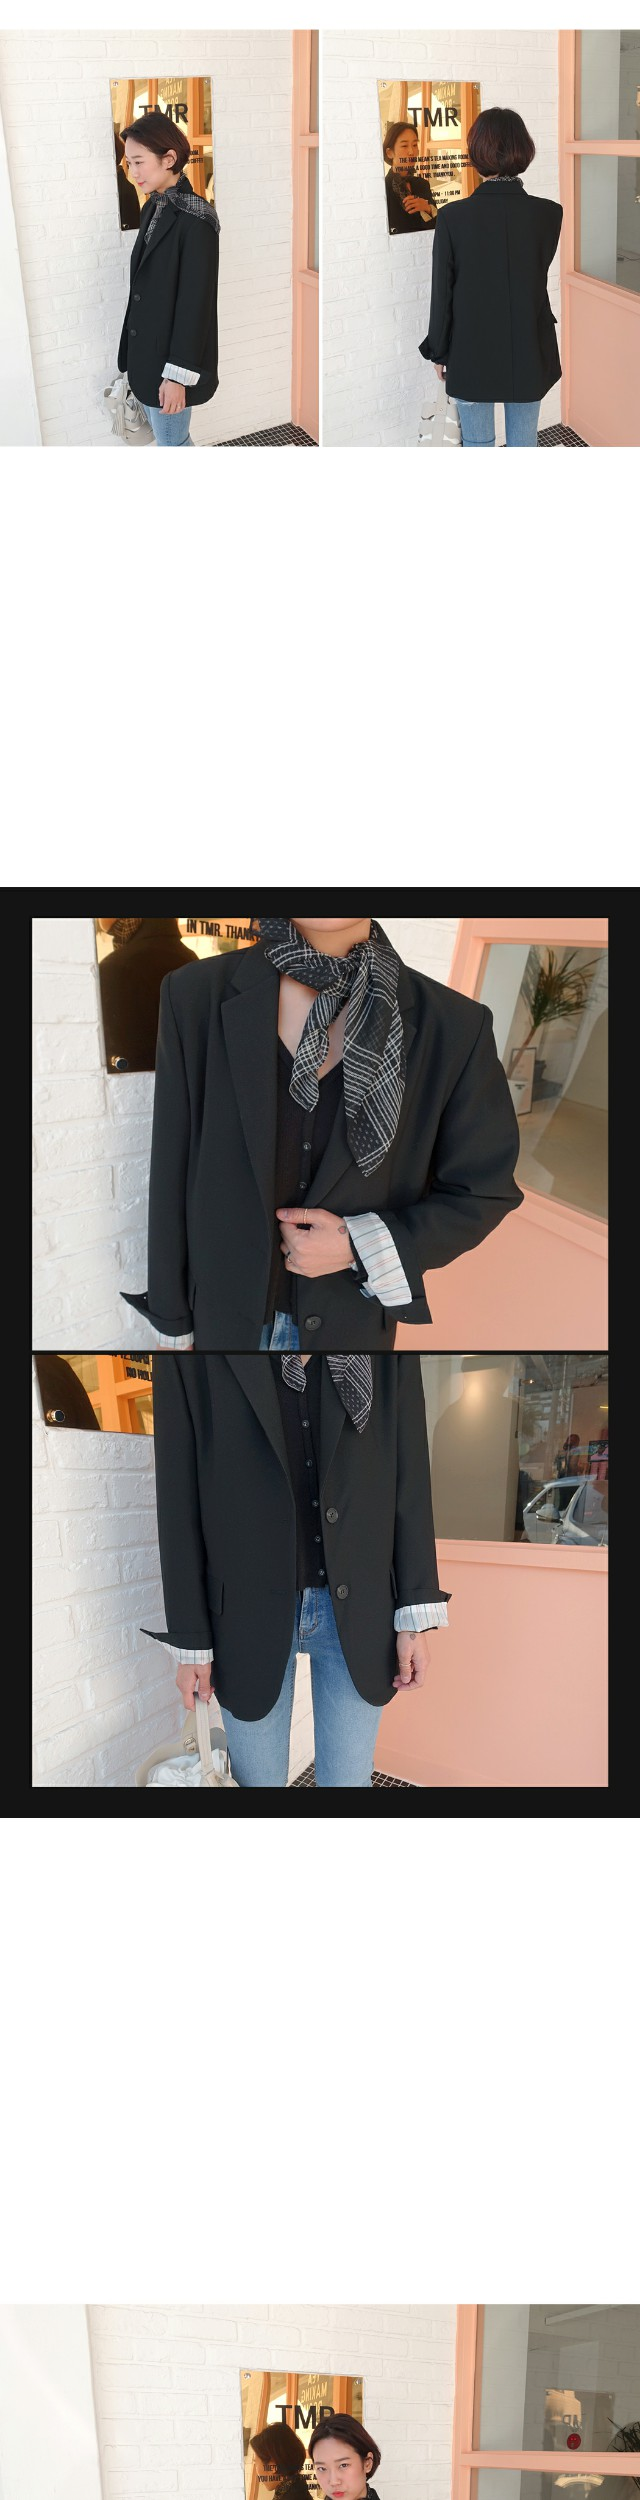 Chic-jacket